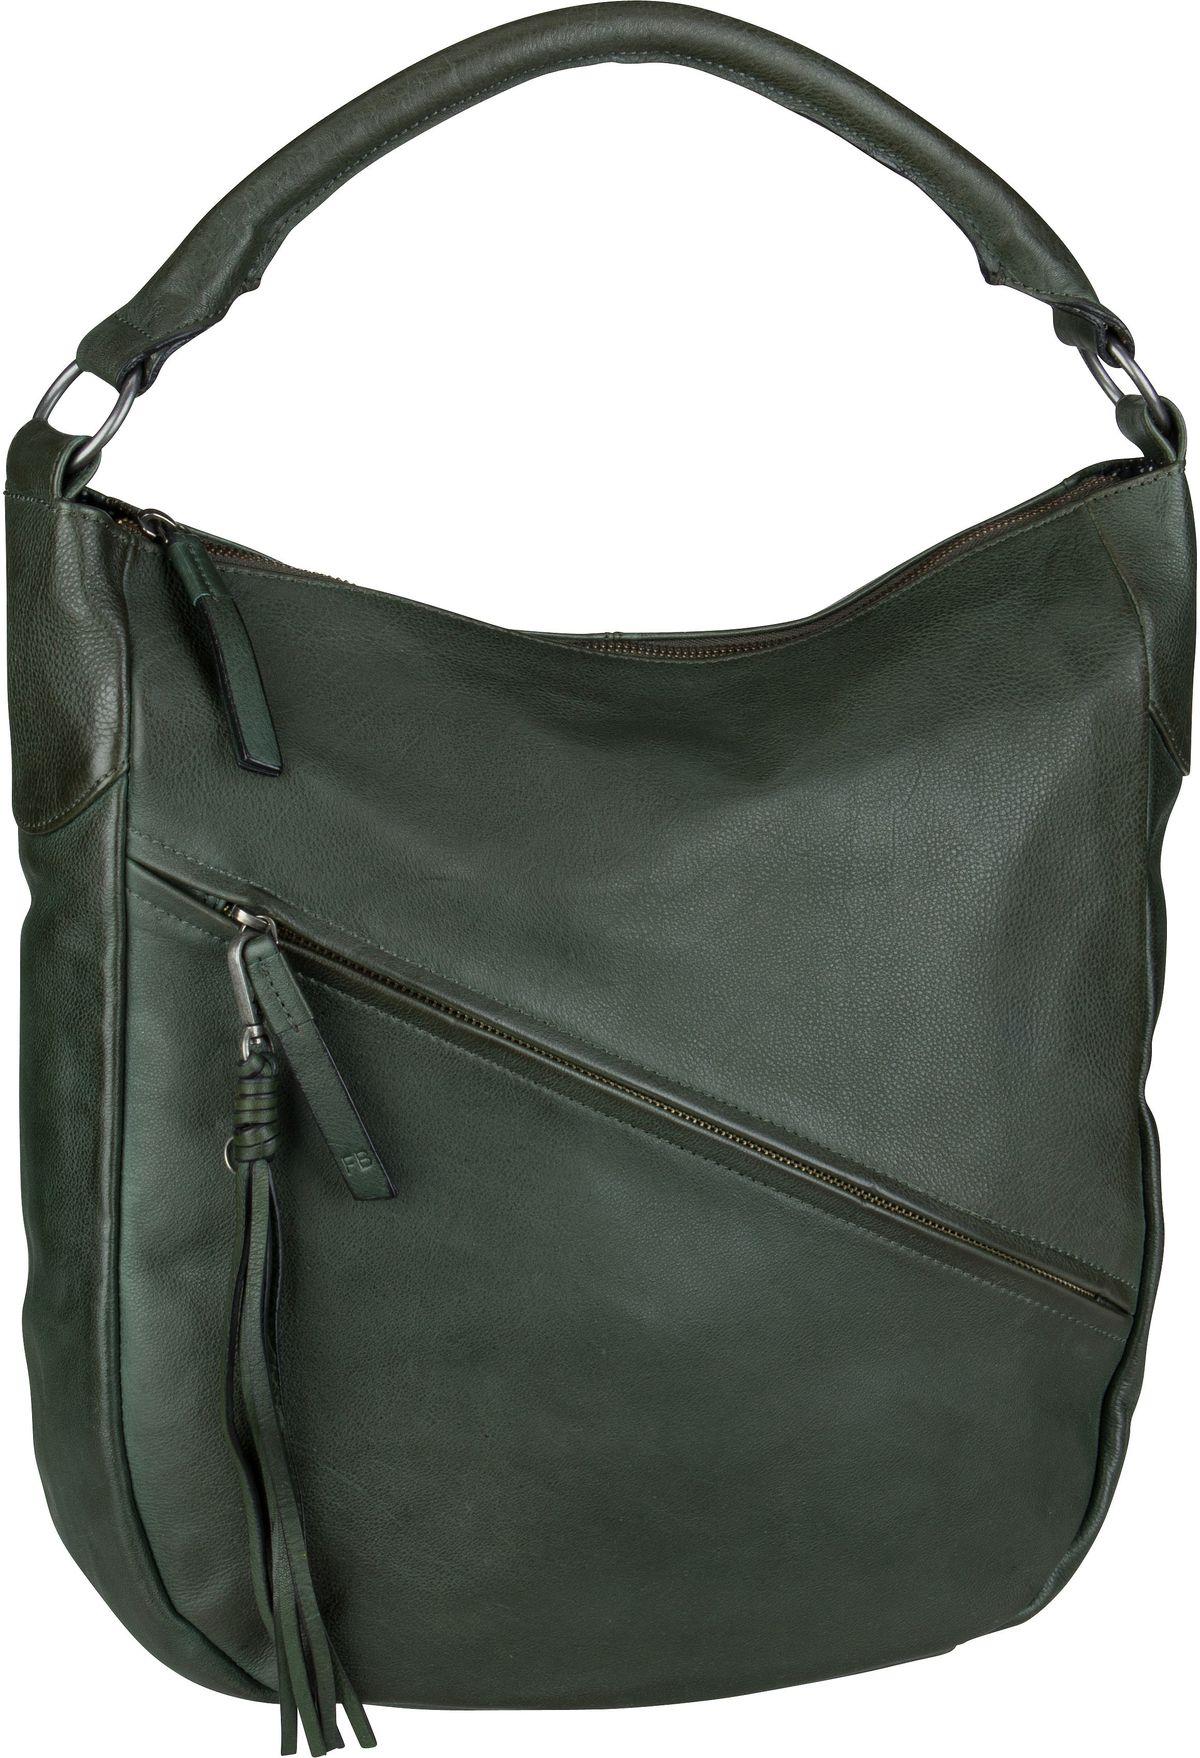 Handtasche Juno Forest Green